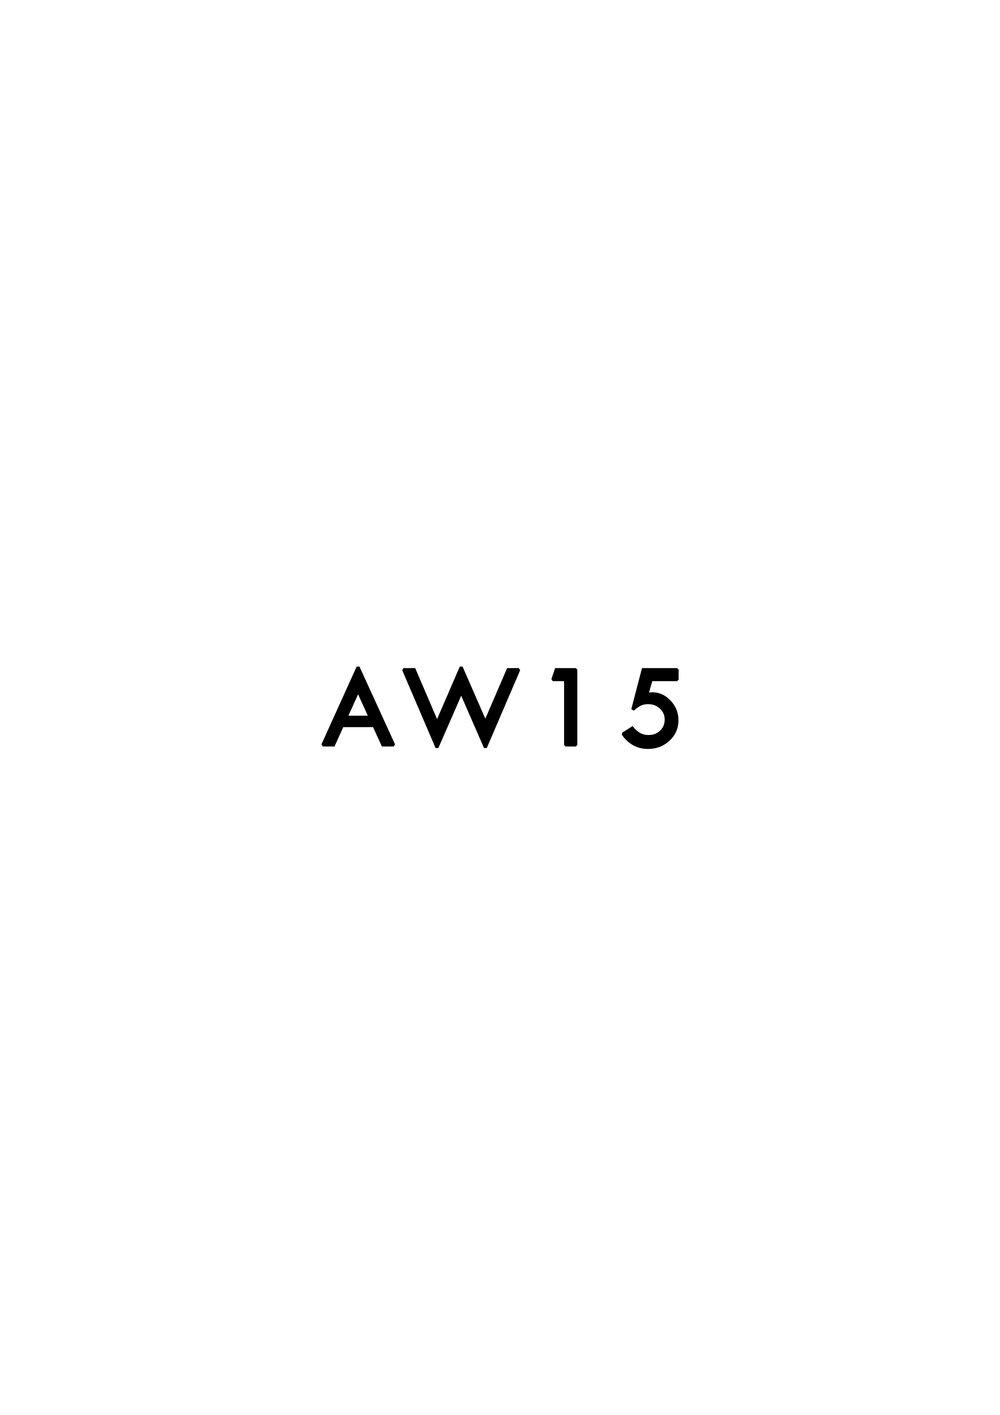 AW15.jpg